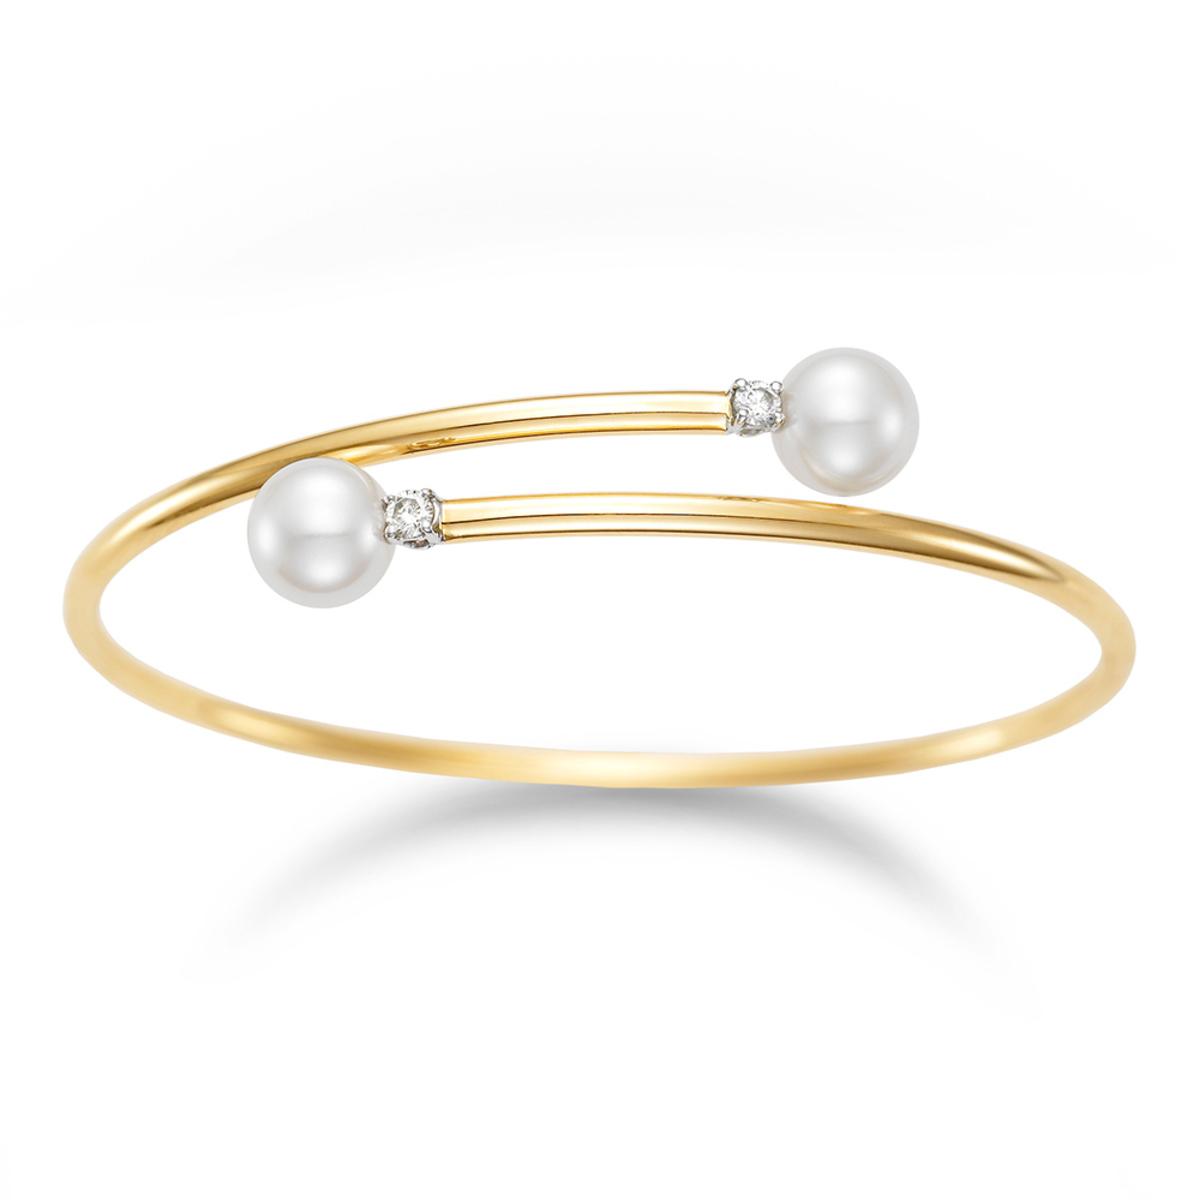 8.5-9.0mm淡水養珠珍珠0.16克拉鑽石手環, 18K黃金